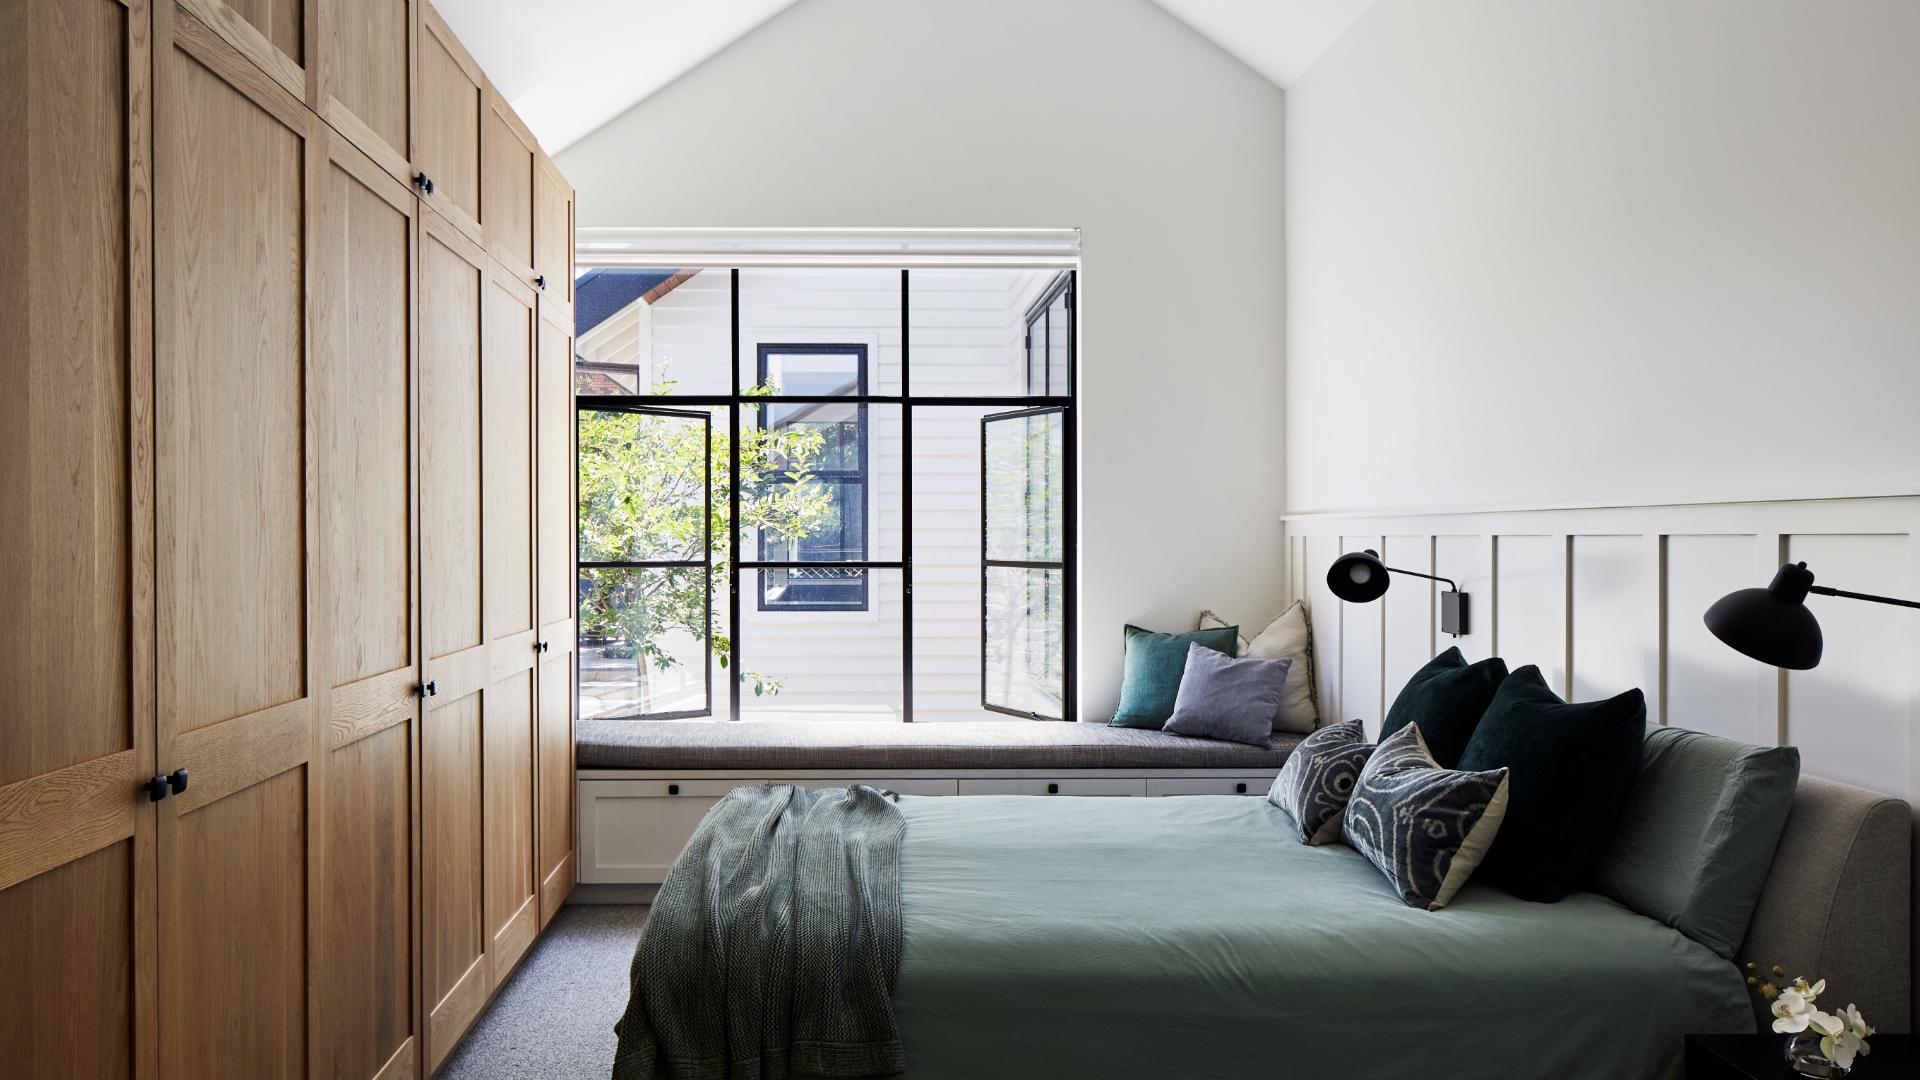 Home - image About-bg on https://www.quadrantdesign.com.au